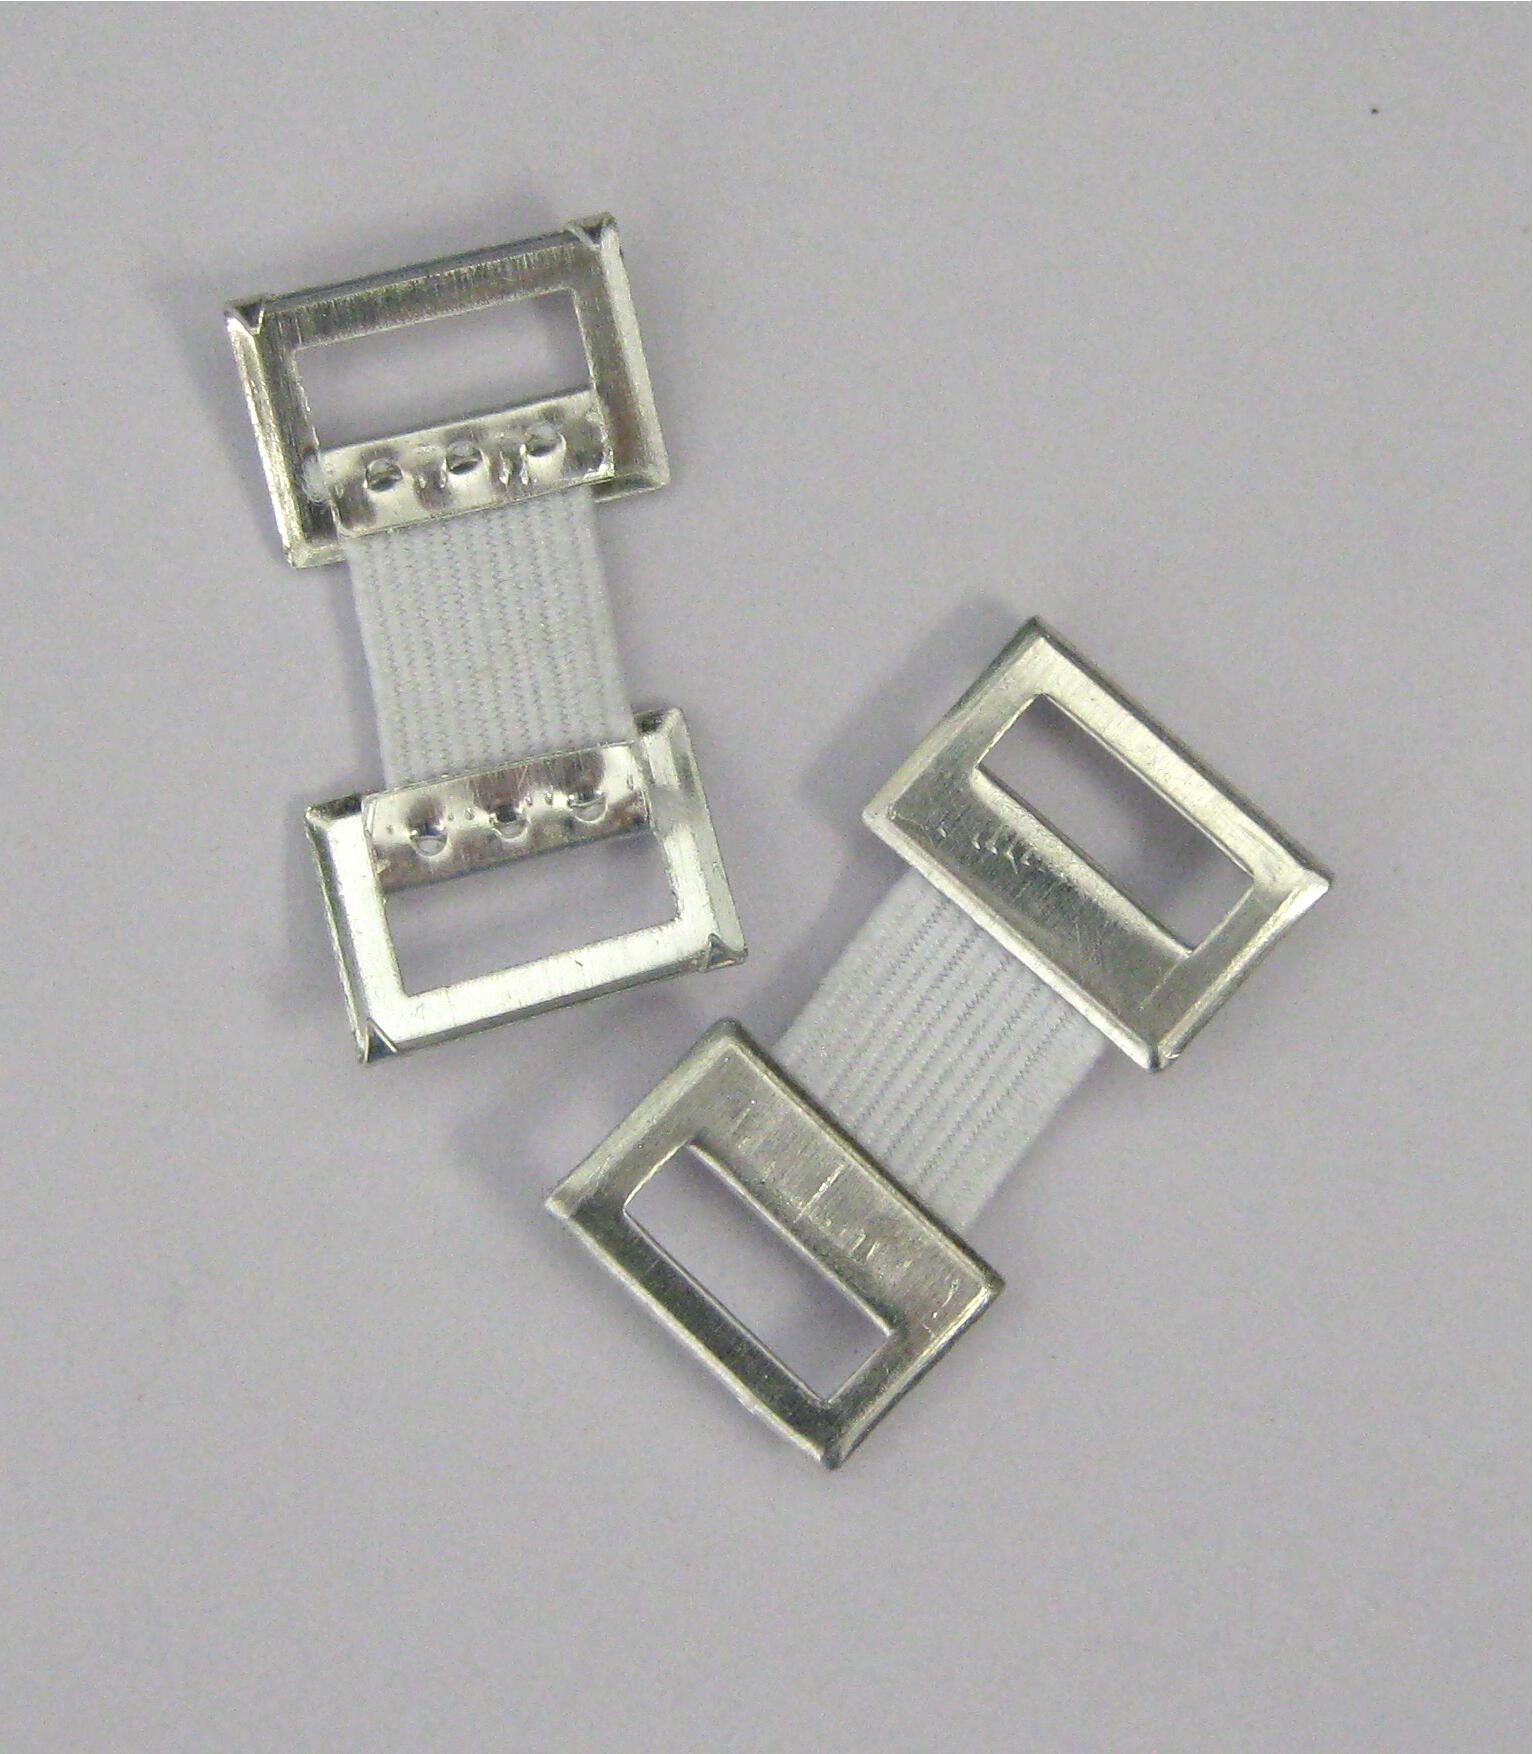 Pins Clips Industrial First Aid Supplies